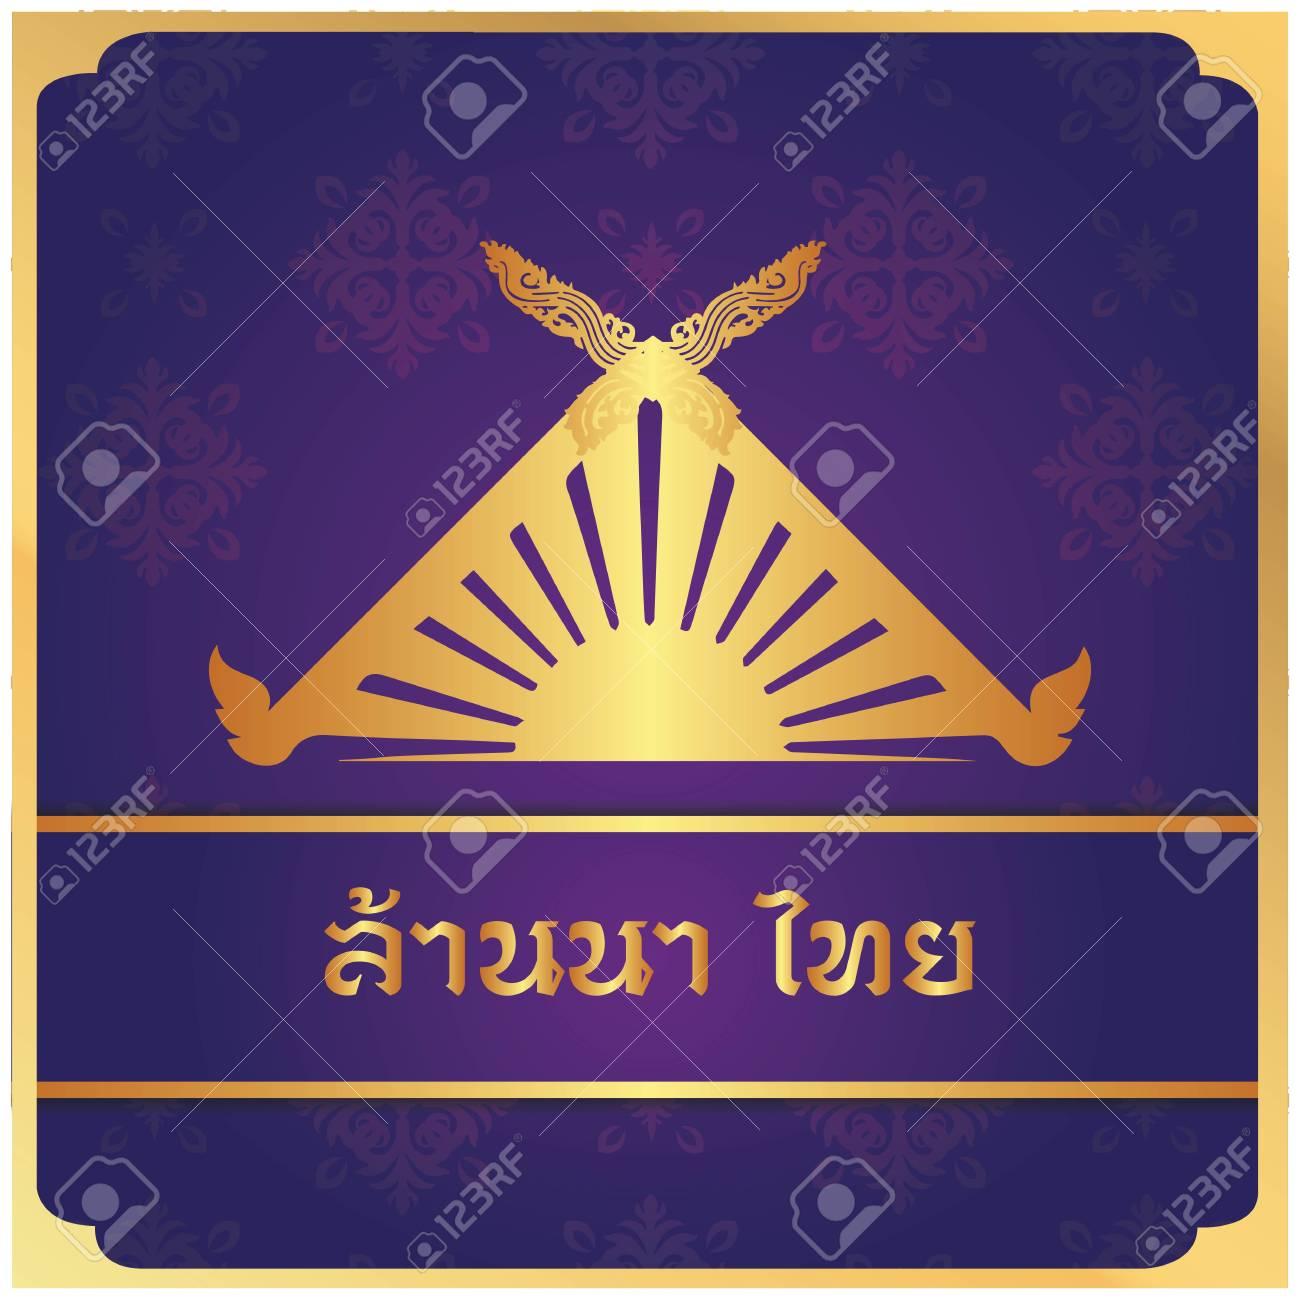 Lanna Thai Isosceles Thai design Blue Background Vector Image - 95522882